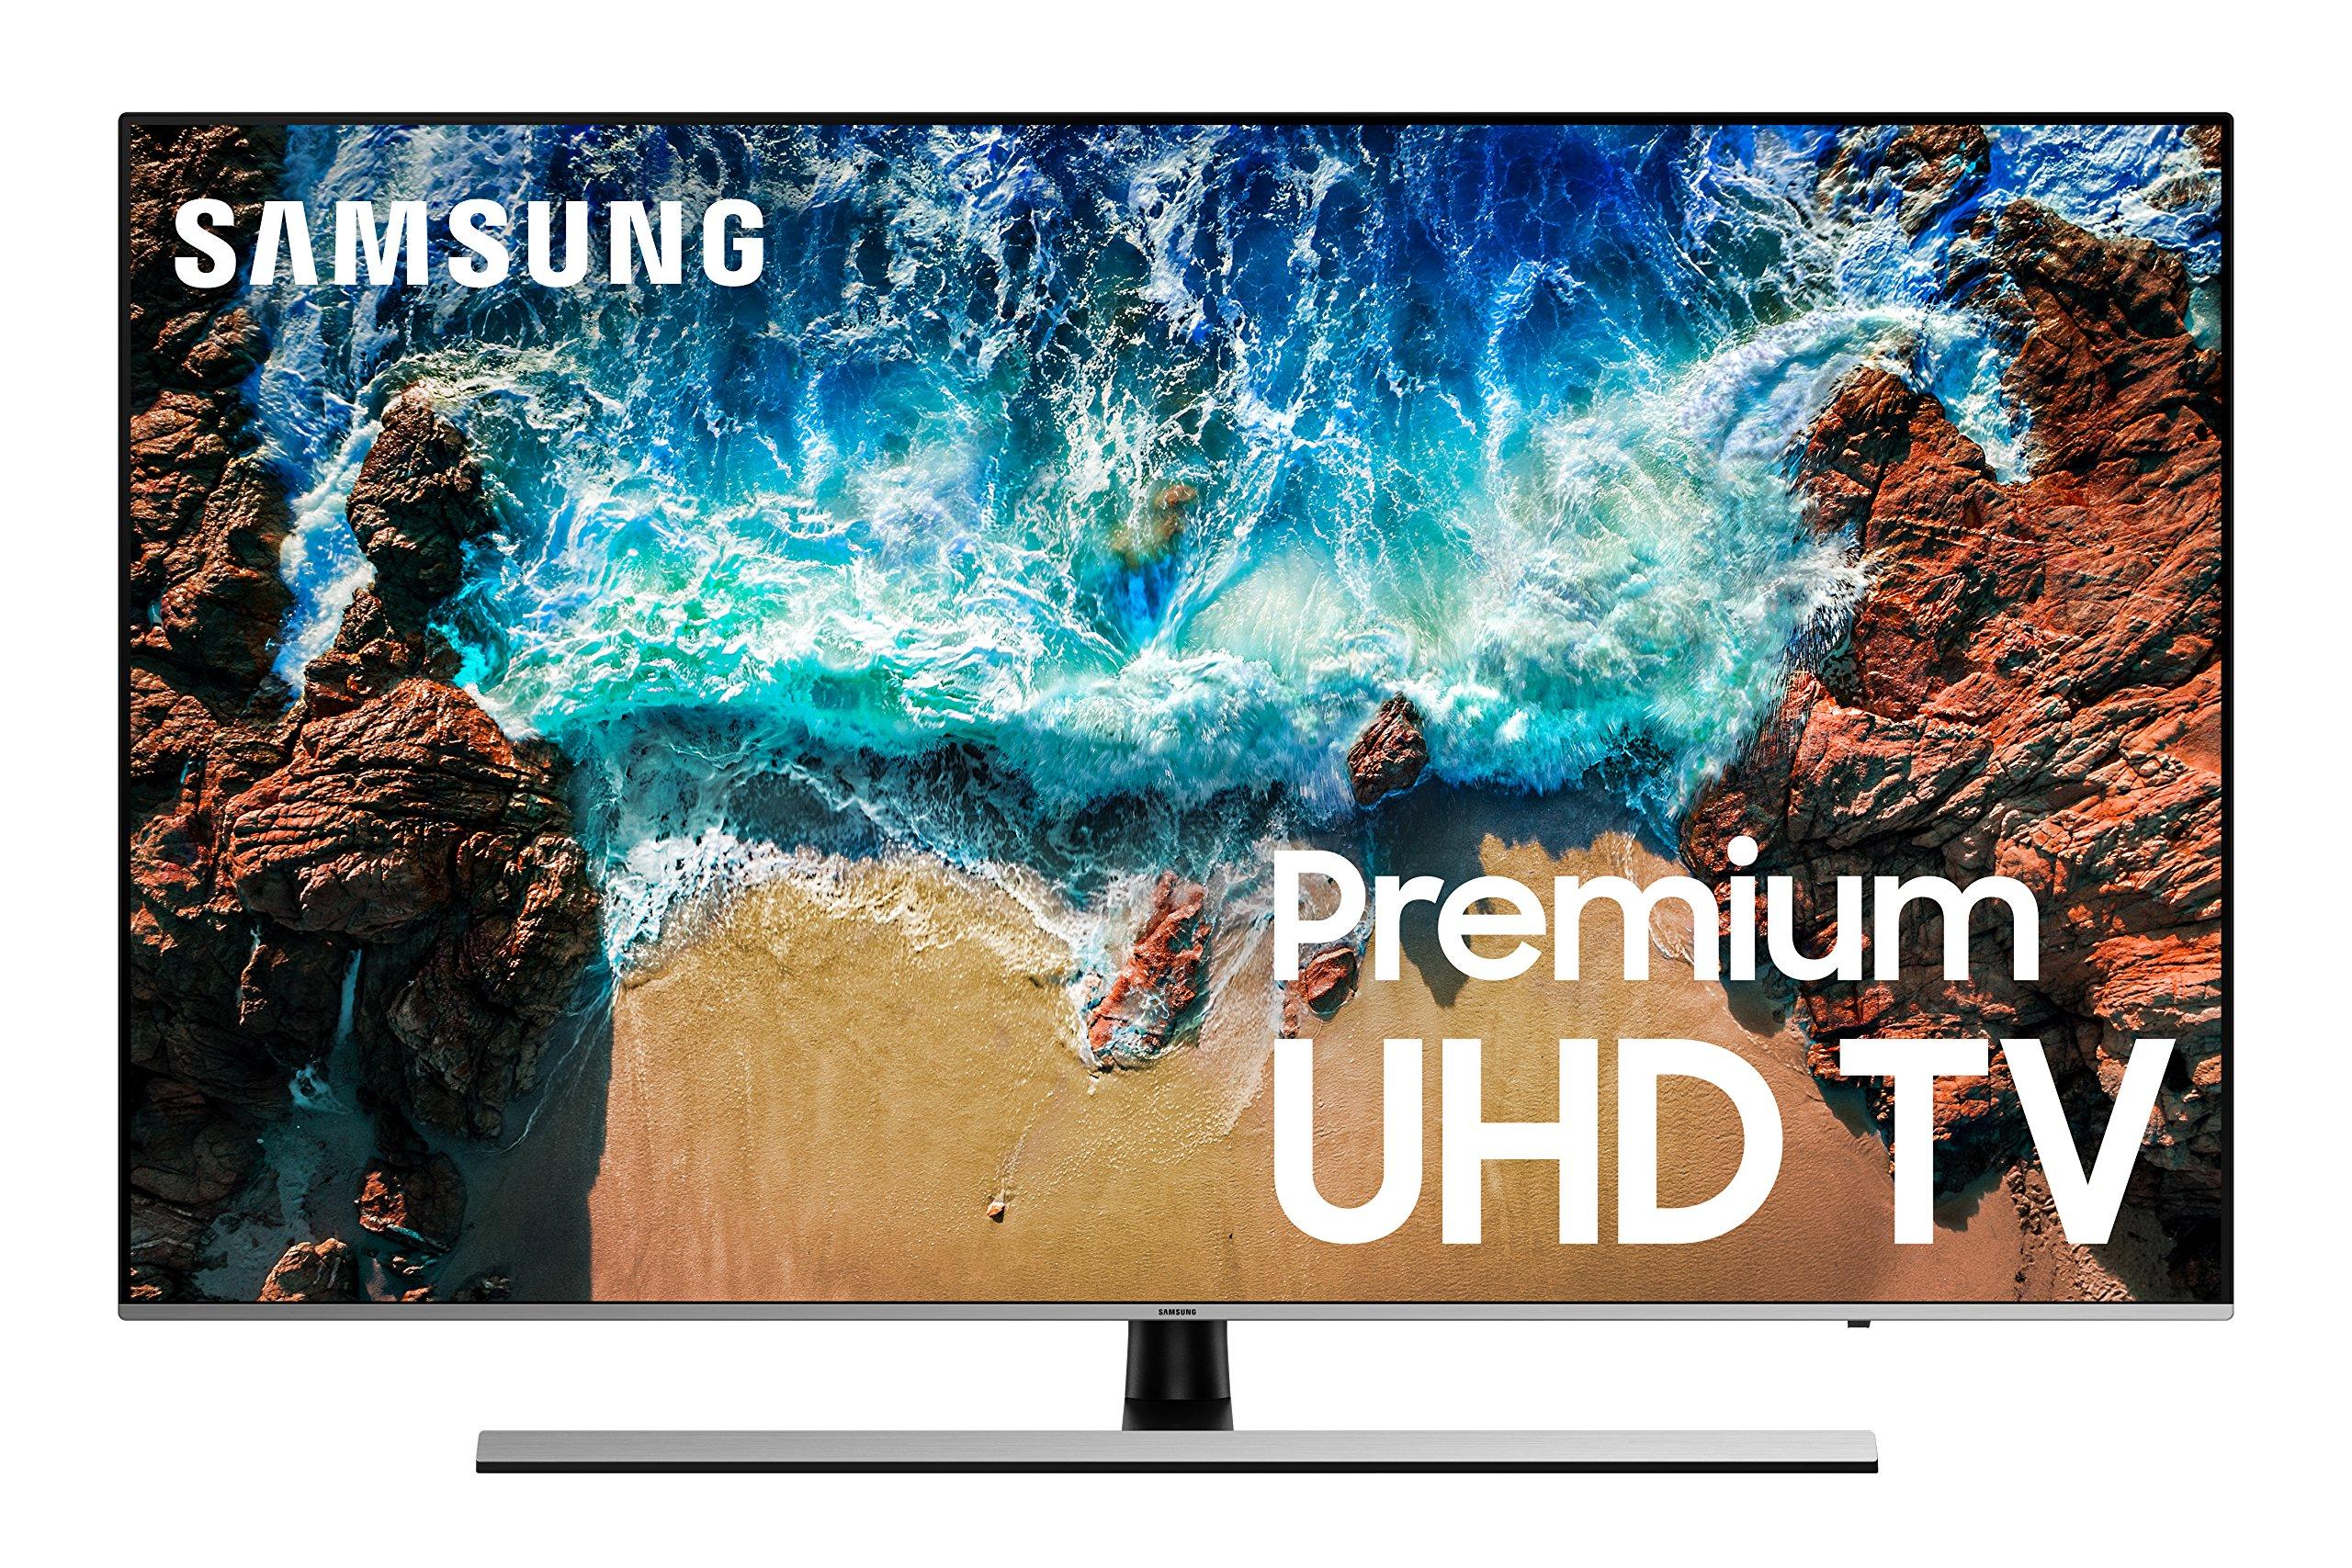 Samsung 4K UHD 8 Series Smart LED TV (2018) 1